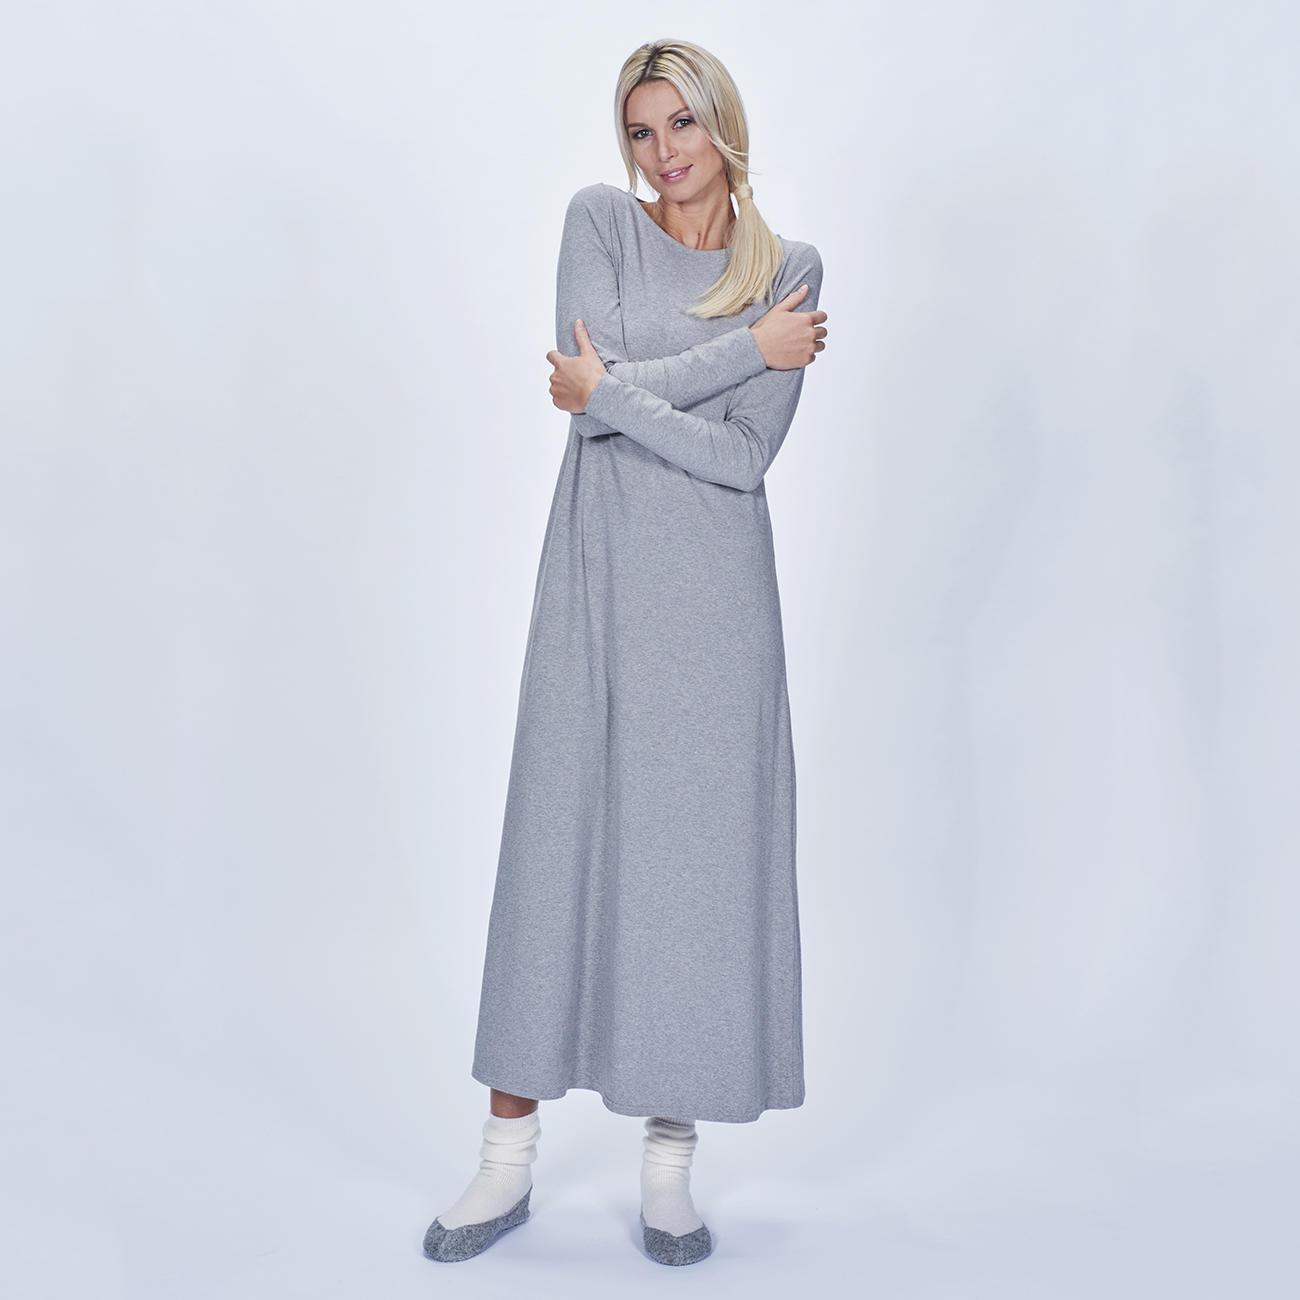 Cornelie Weiss Maxi-Shirtkleid, Longshirt oder Sweatpants, 40 - Grau - Maxi-Shirtkleid :: Grau - 40 -  - Erwachsene